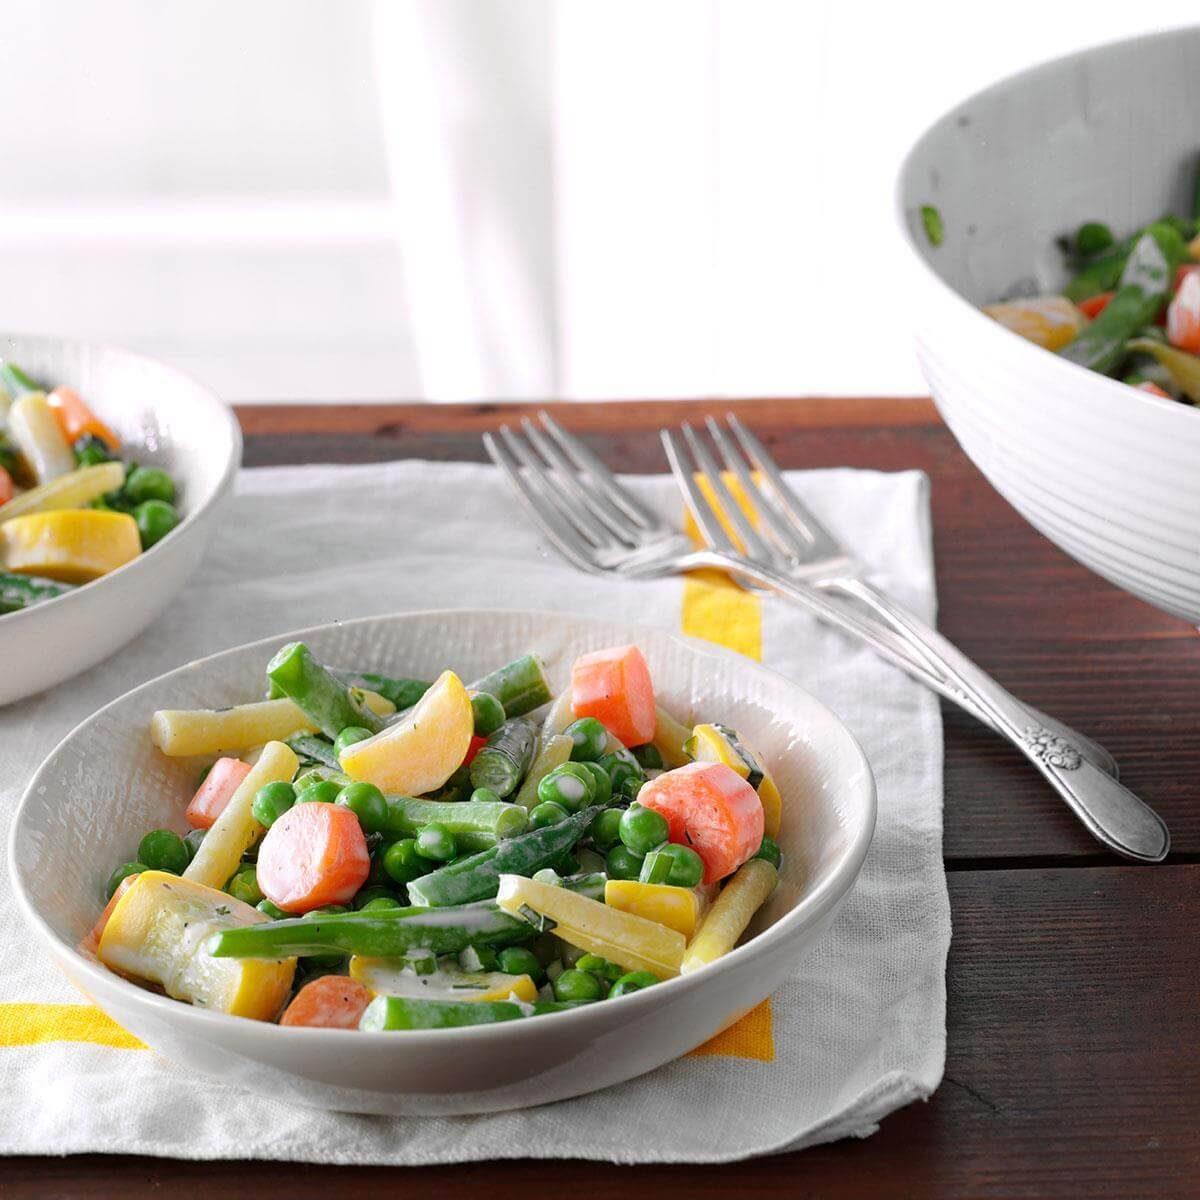 Cream of the crop veggies